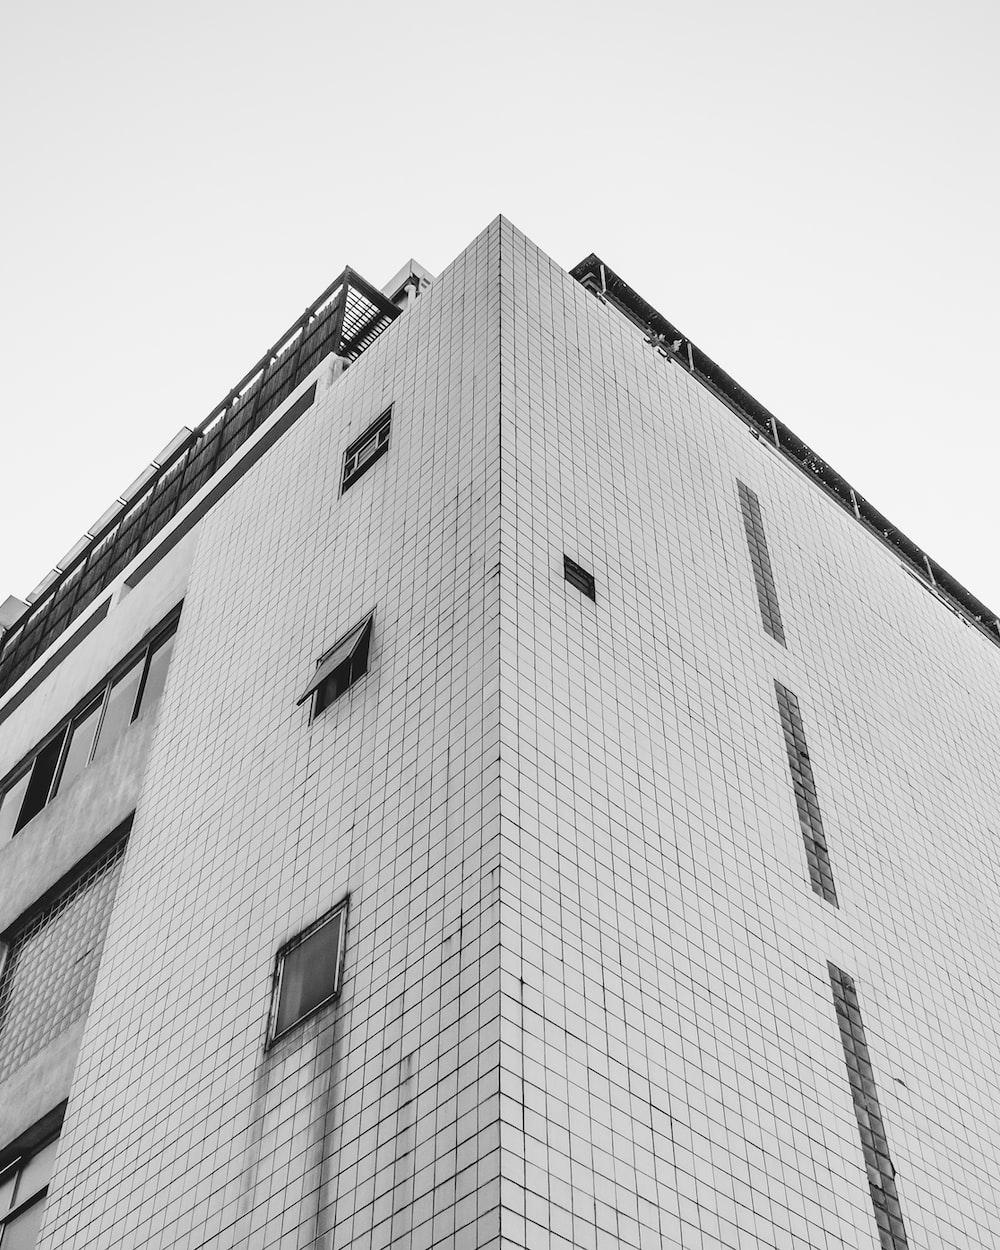 gray concrete building